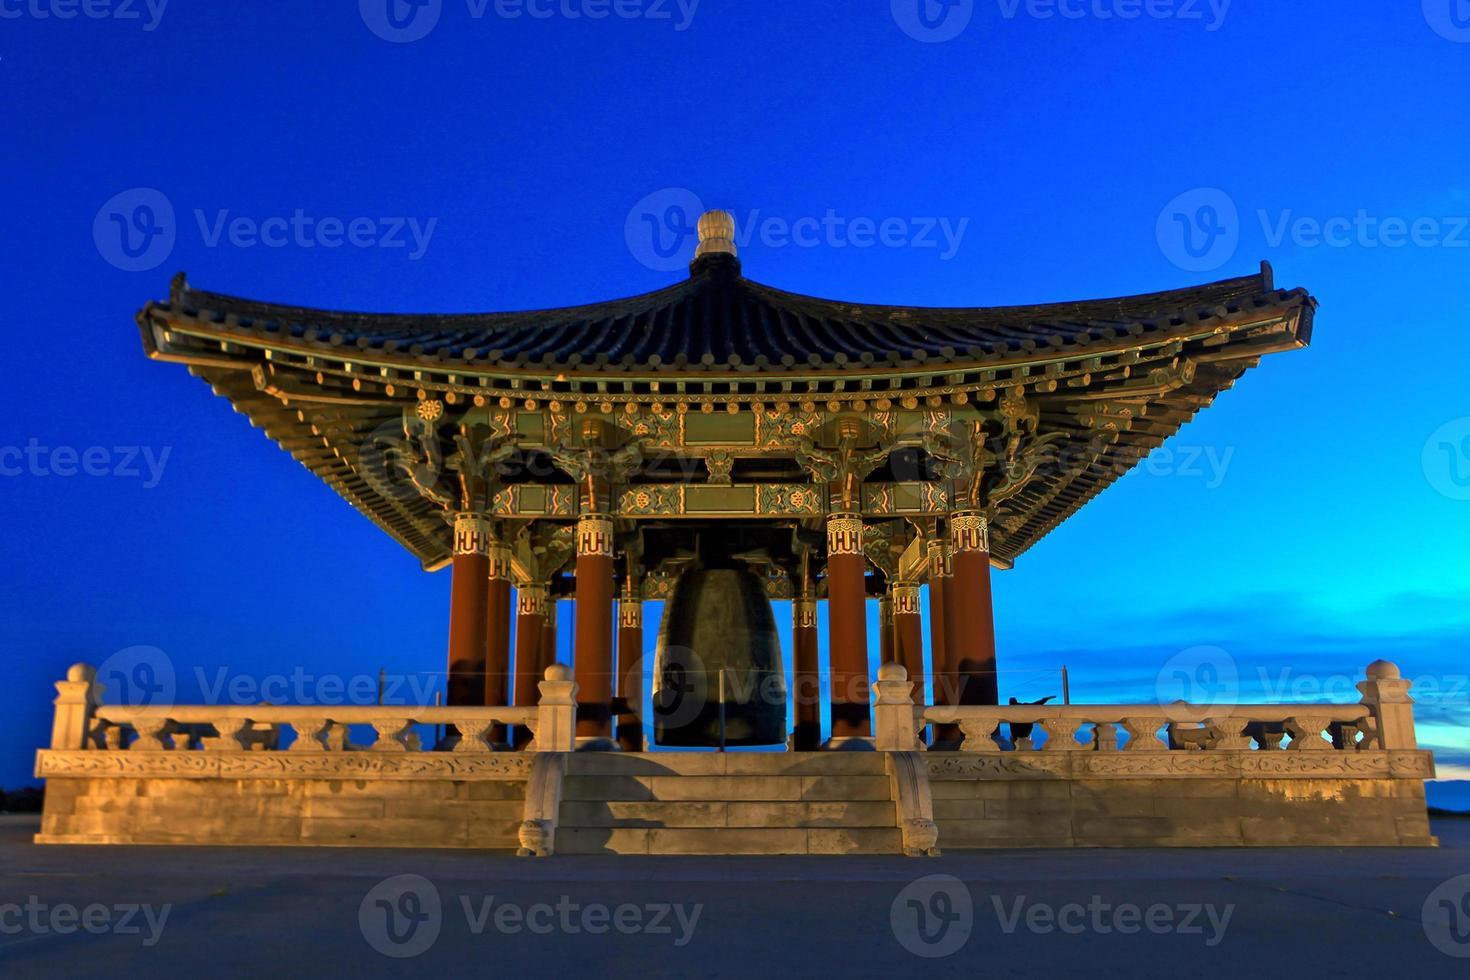 Touristendenkmal koreanische Freundschaftsglocke in San Pedro, Cailfornia foto